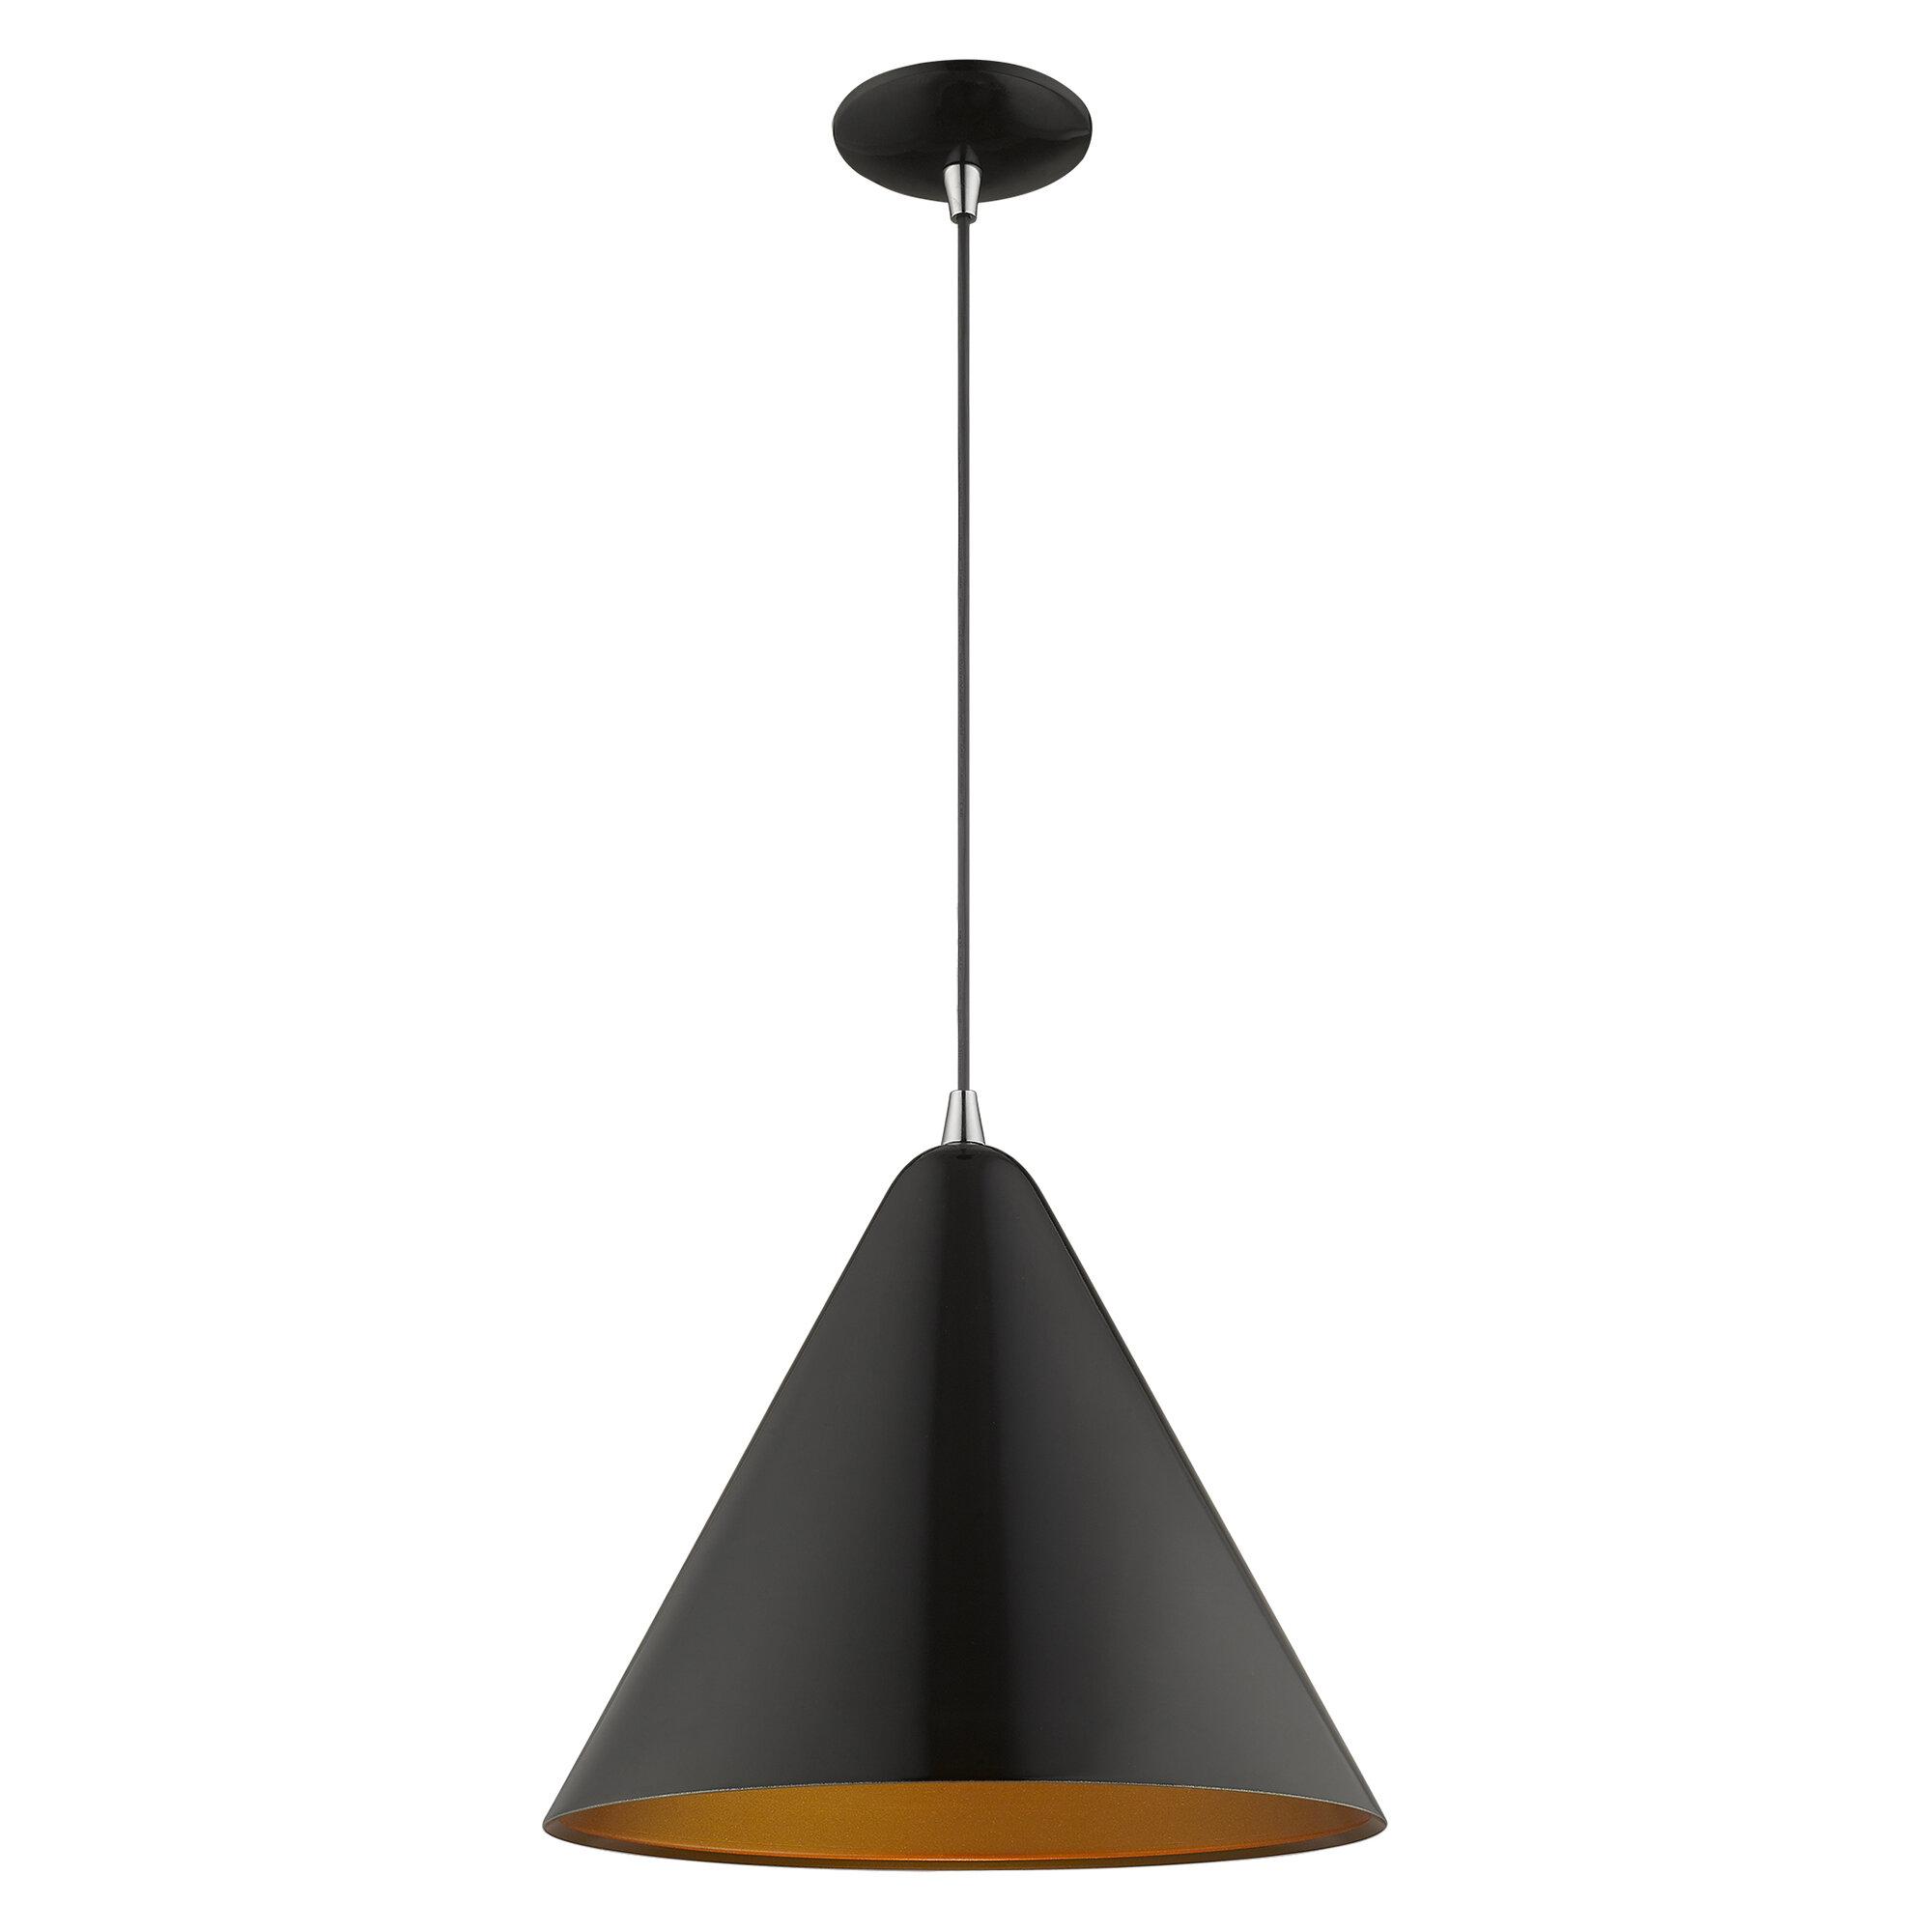 Allmodern 1 Light Single Cone Pendant Reviews Wayfair